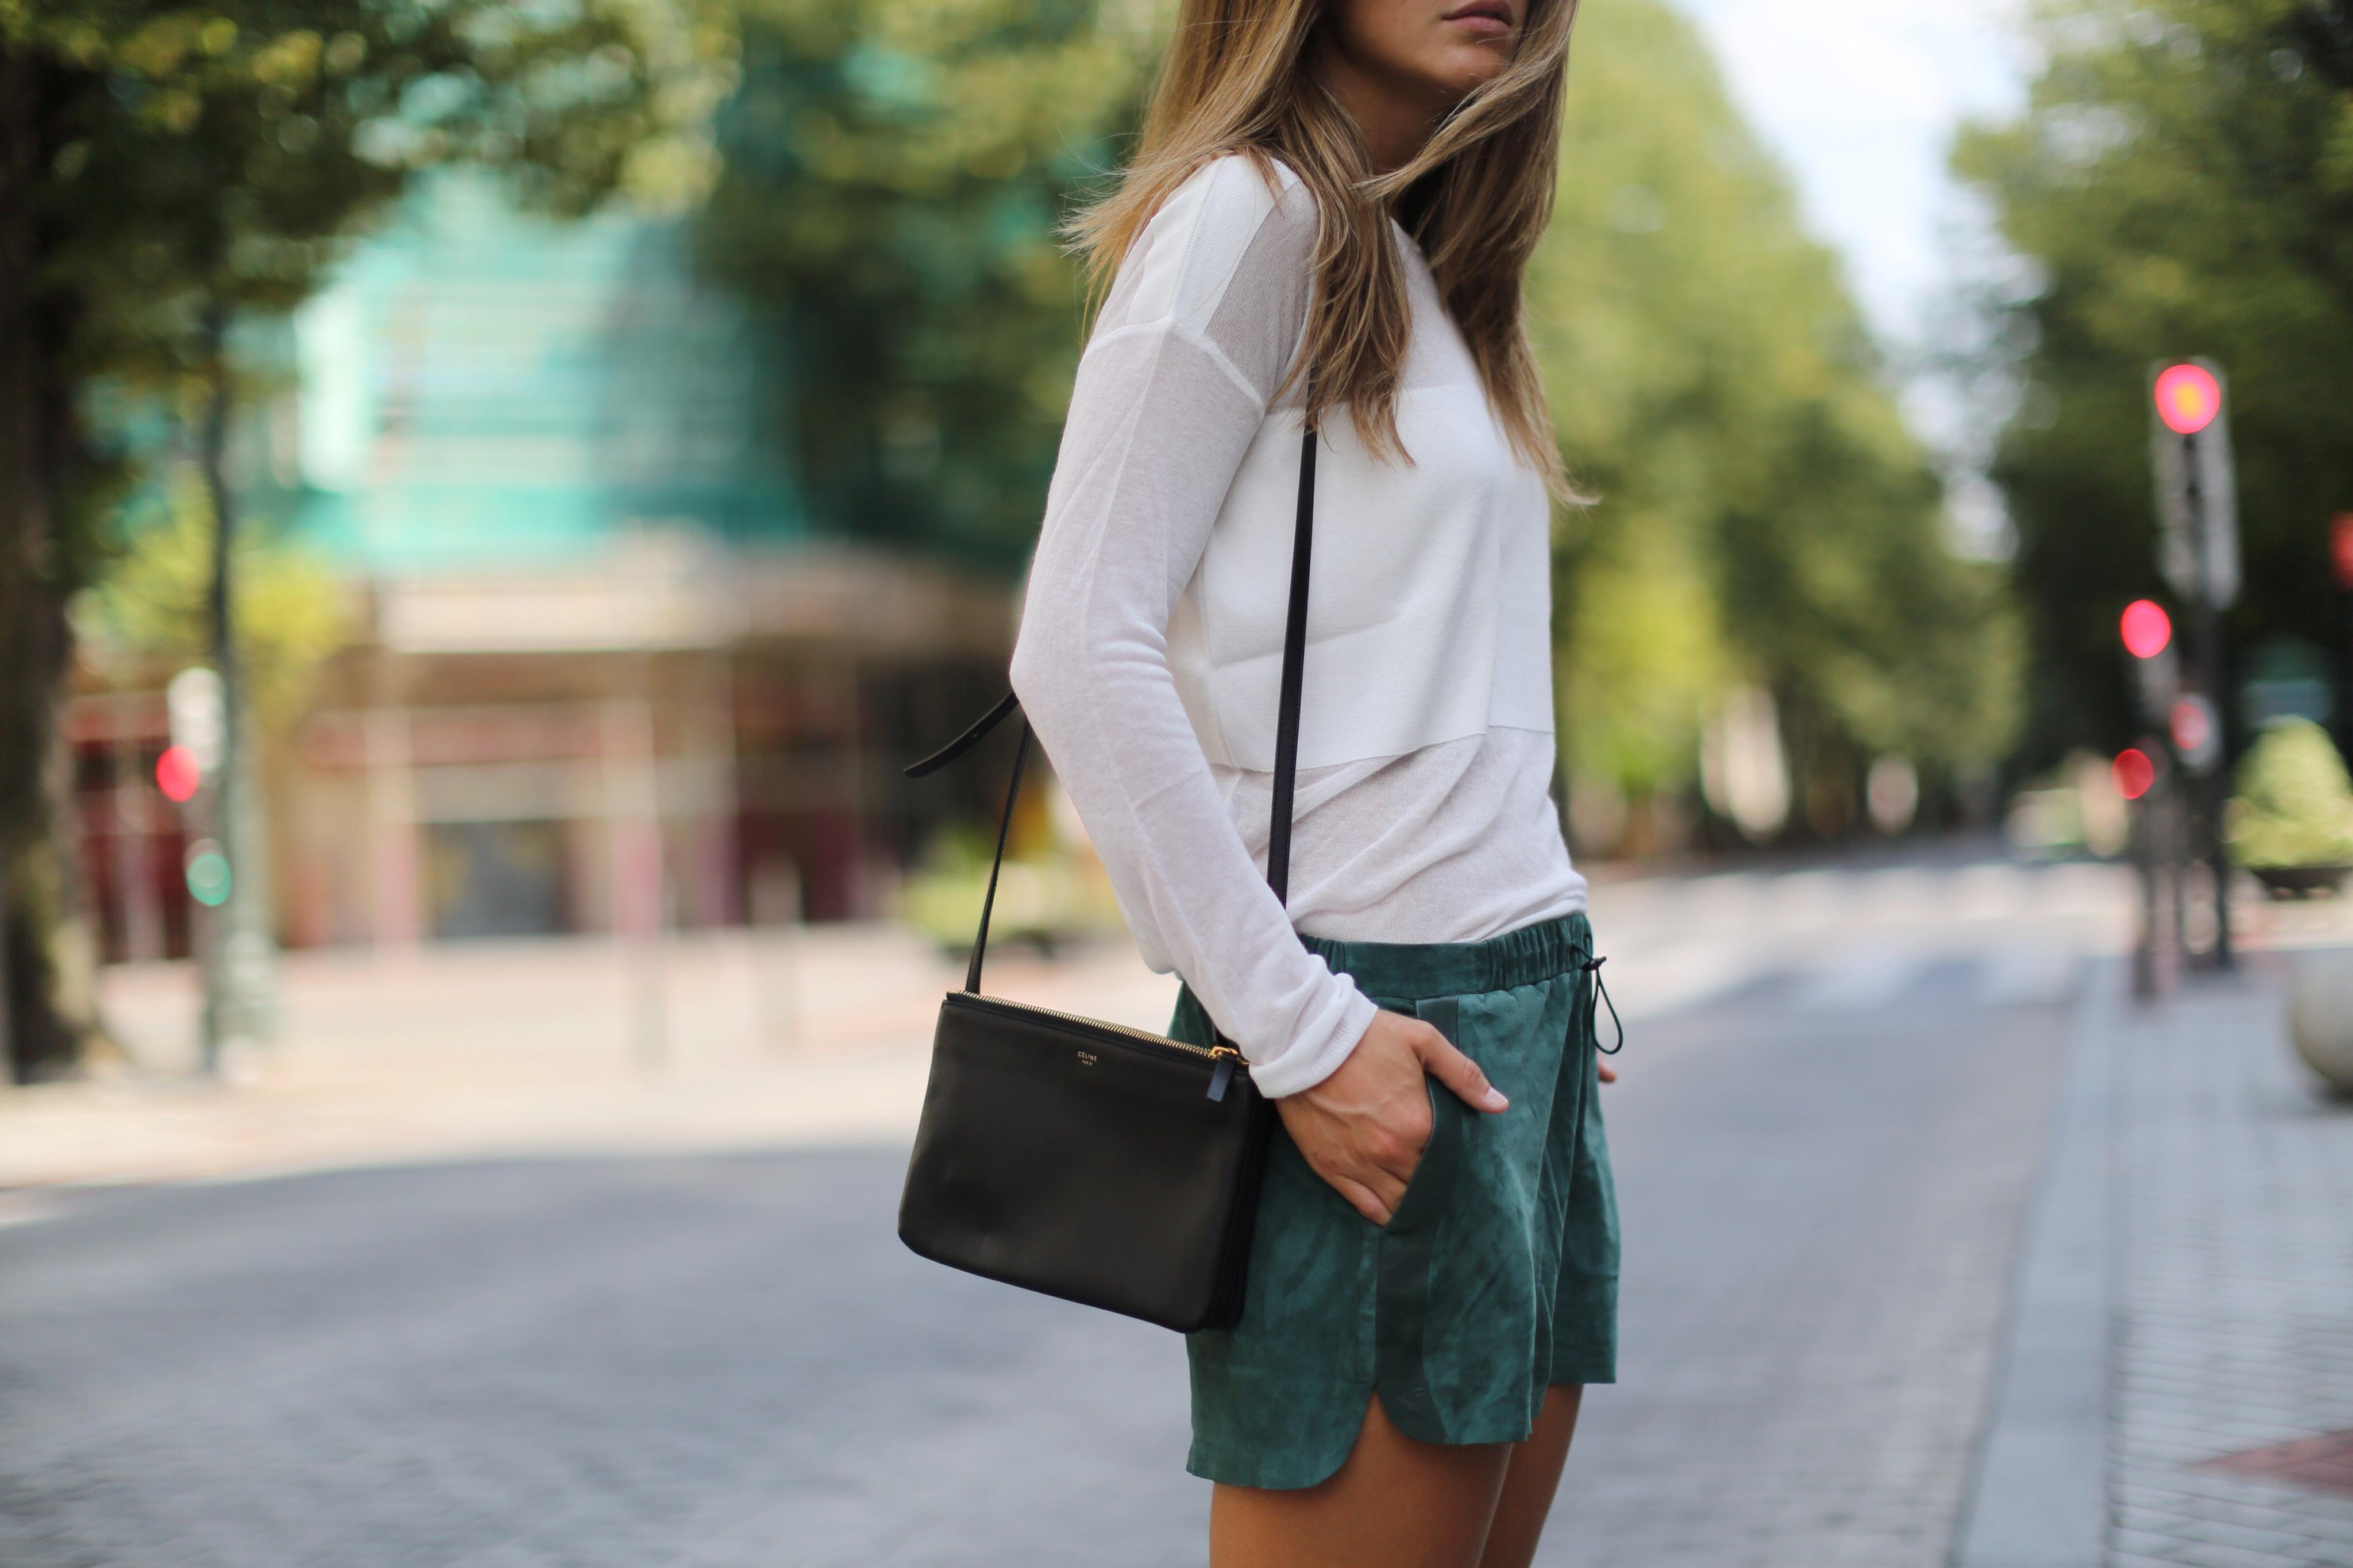 Clochet_h&m_trend_suede_shorts_converse_celine_trio_bag_04